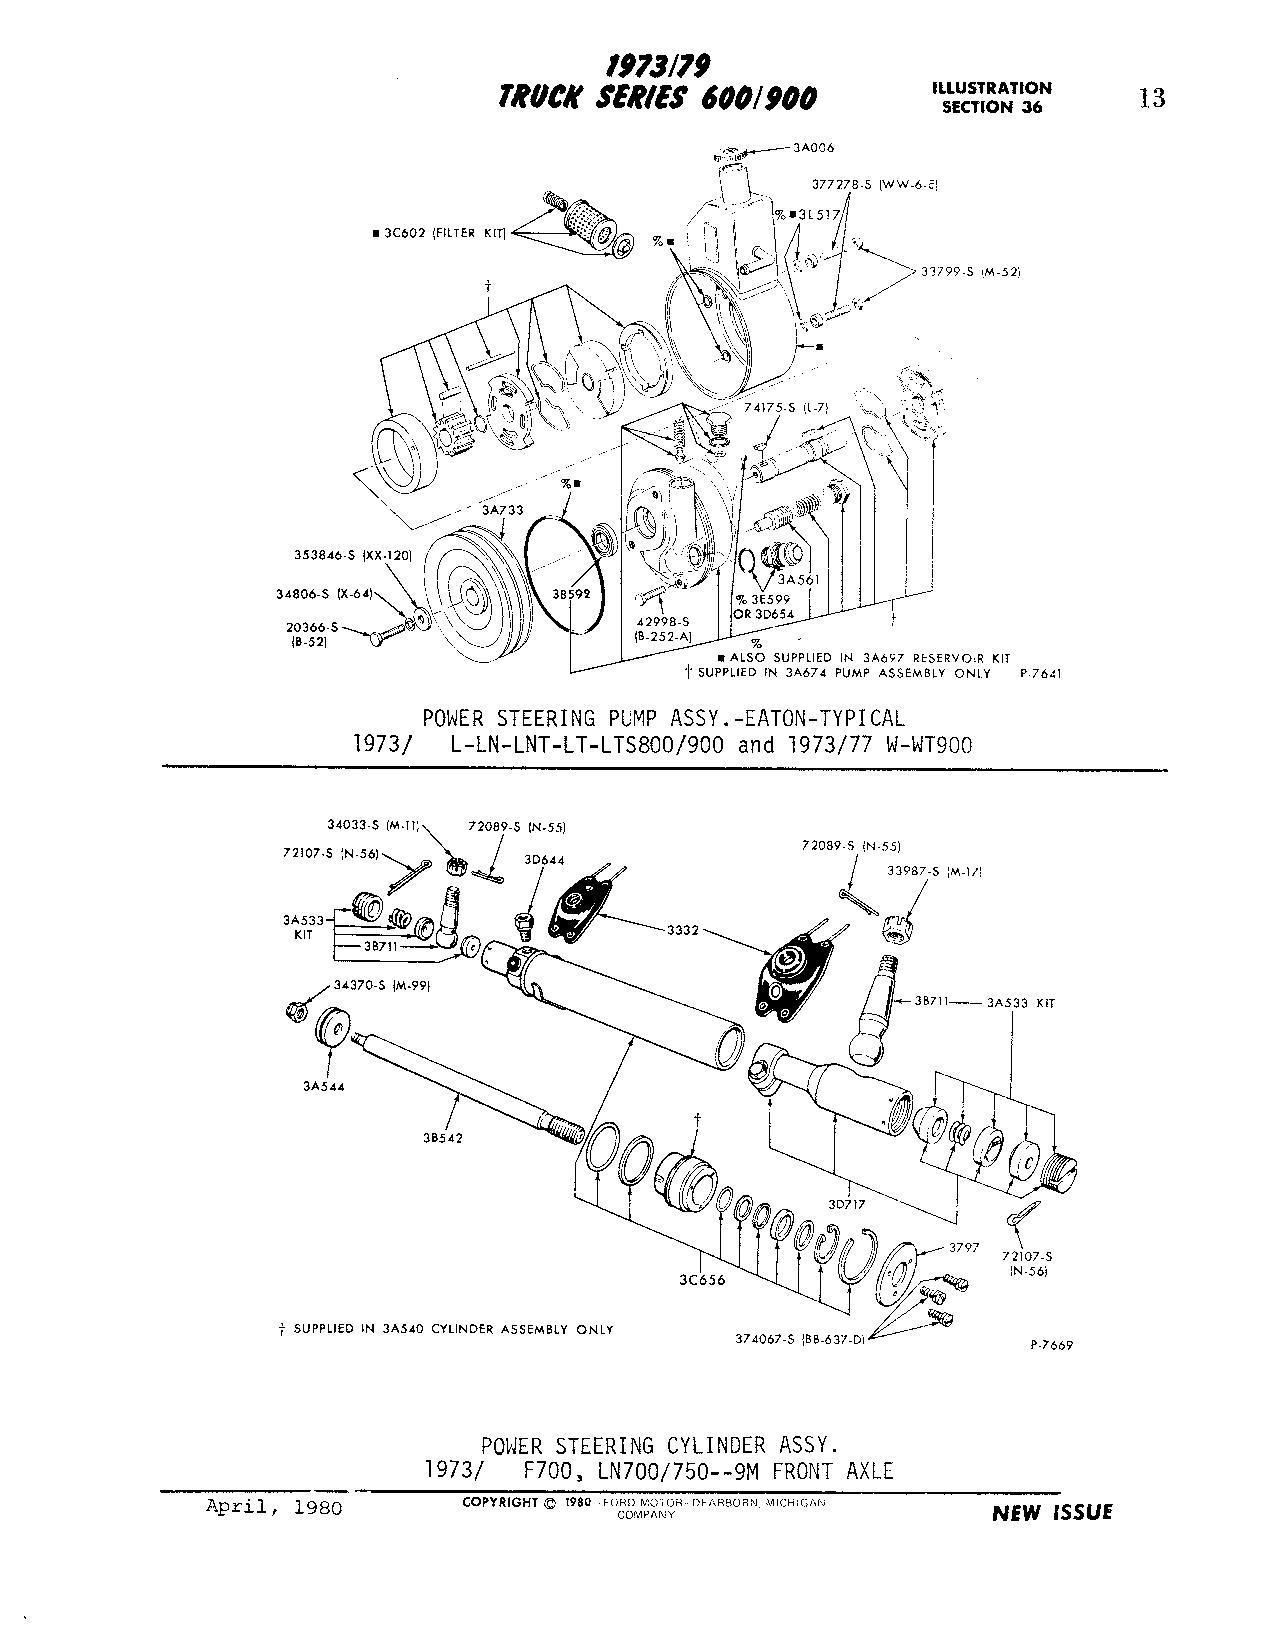 Ford F700 Dump Truck Part Id Request